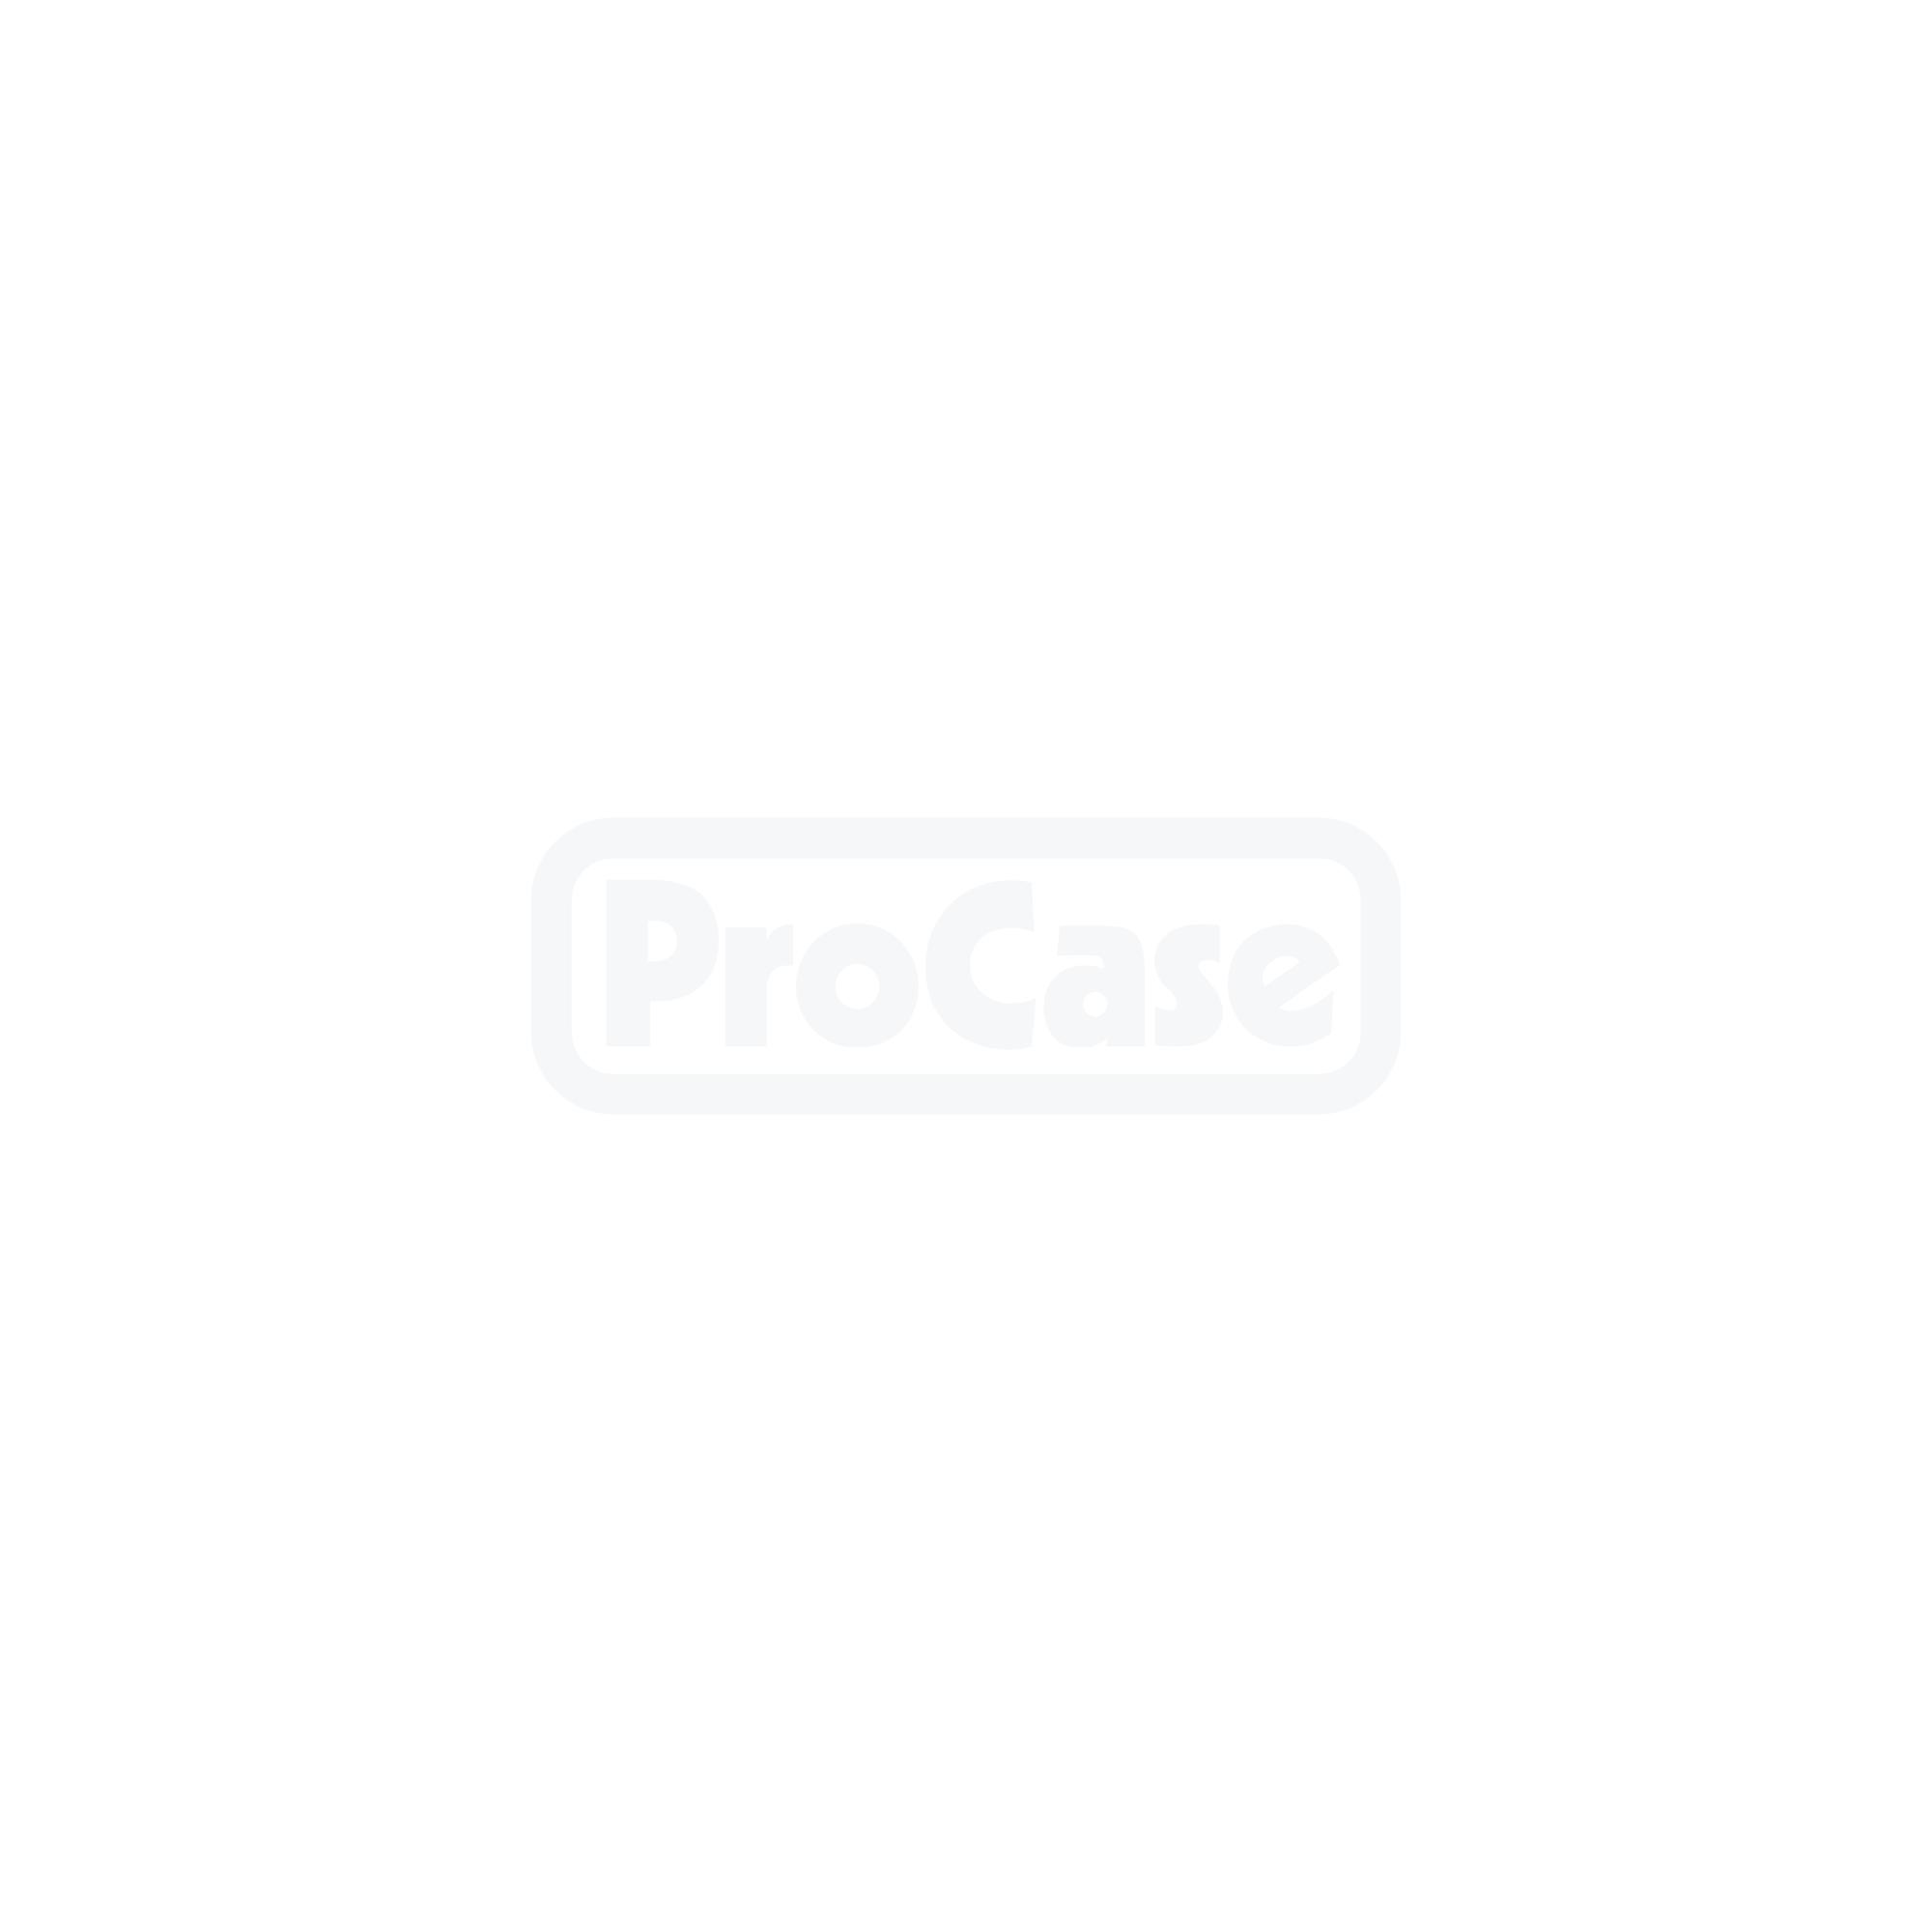 Transportkoffer für OP Kamera MAQUET Orchide HD 2